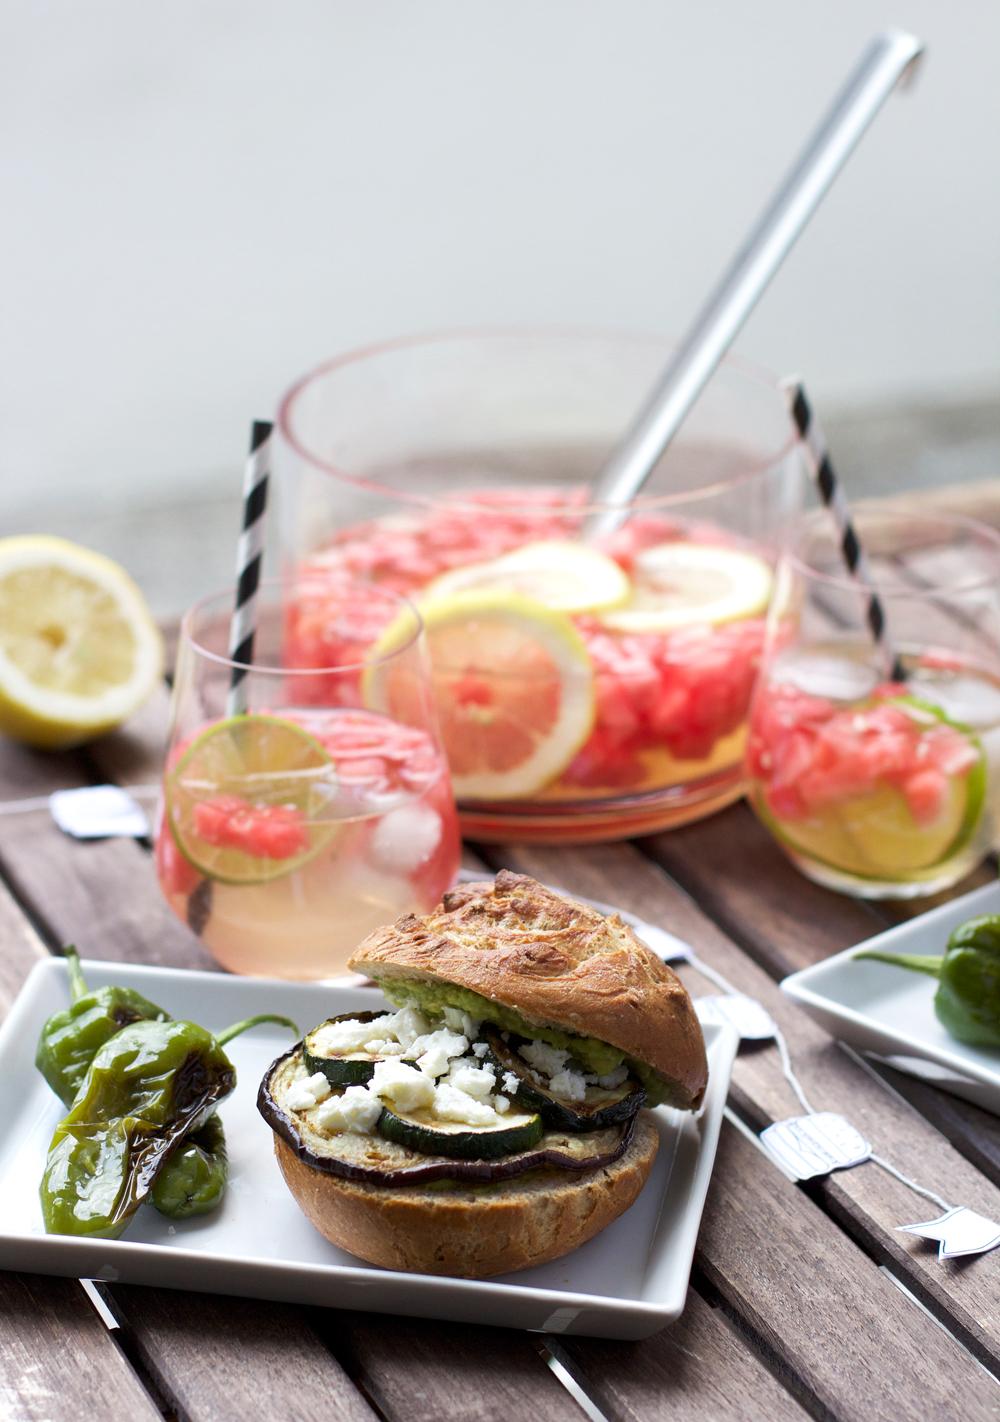 Rezept: Veggie-Burger mit Grillgemüse |we love handmade